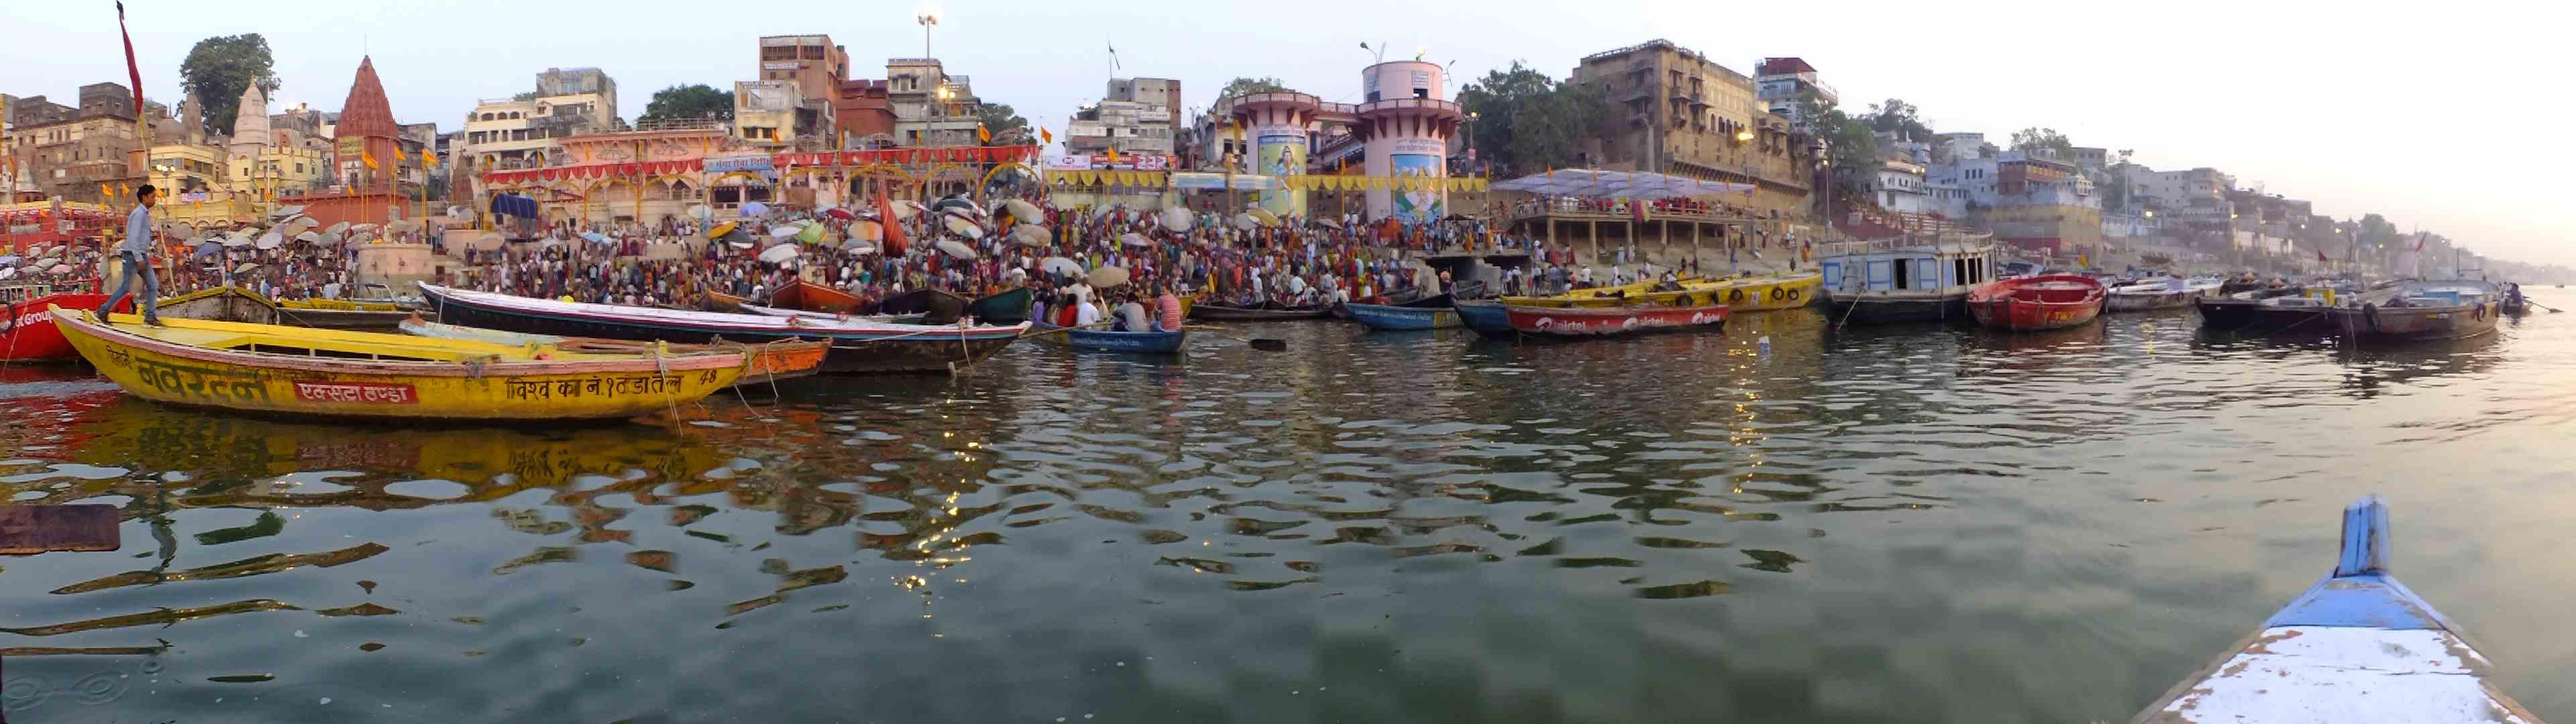 shopping in varanasi - shopping attractions of varanasi